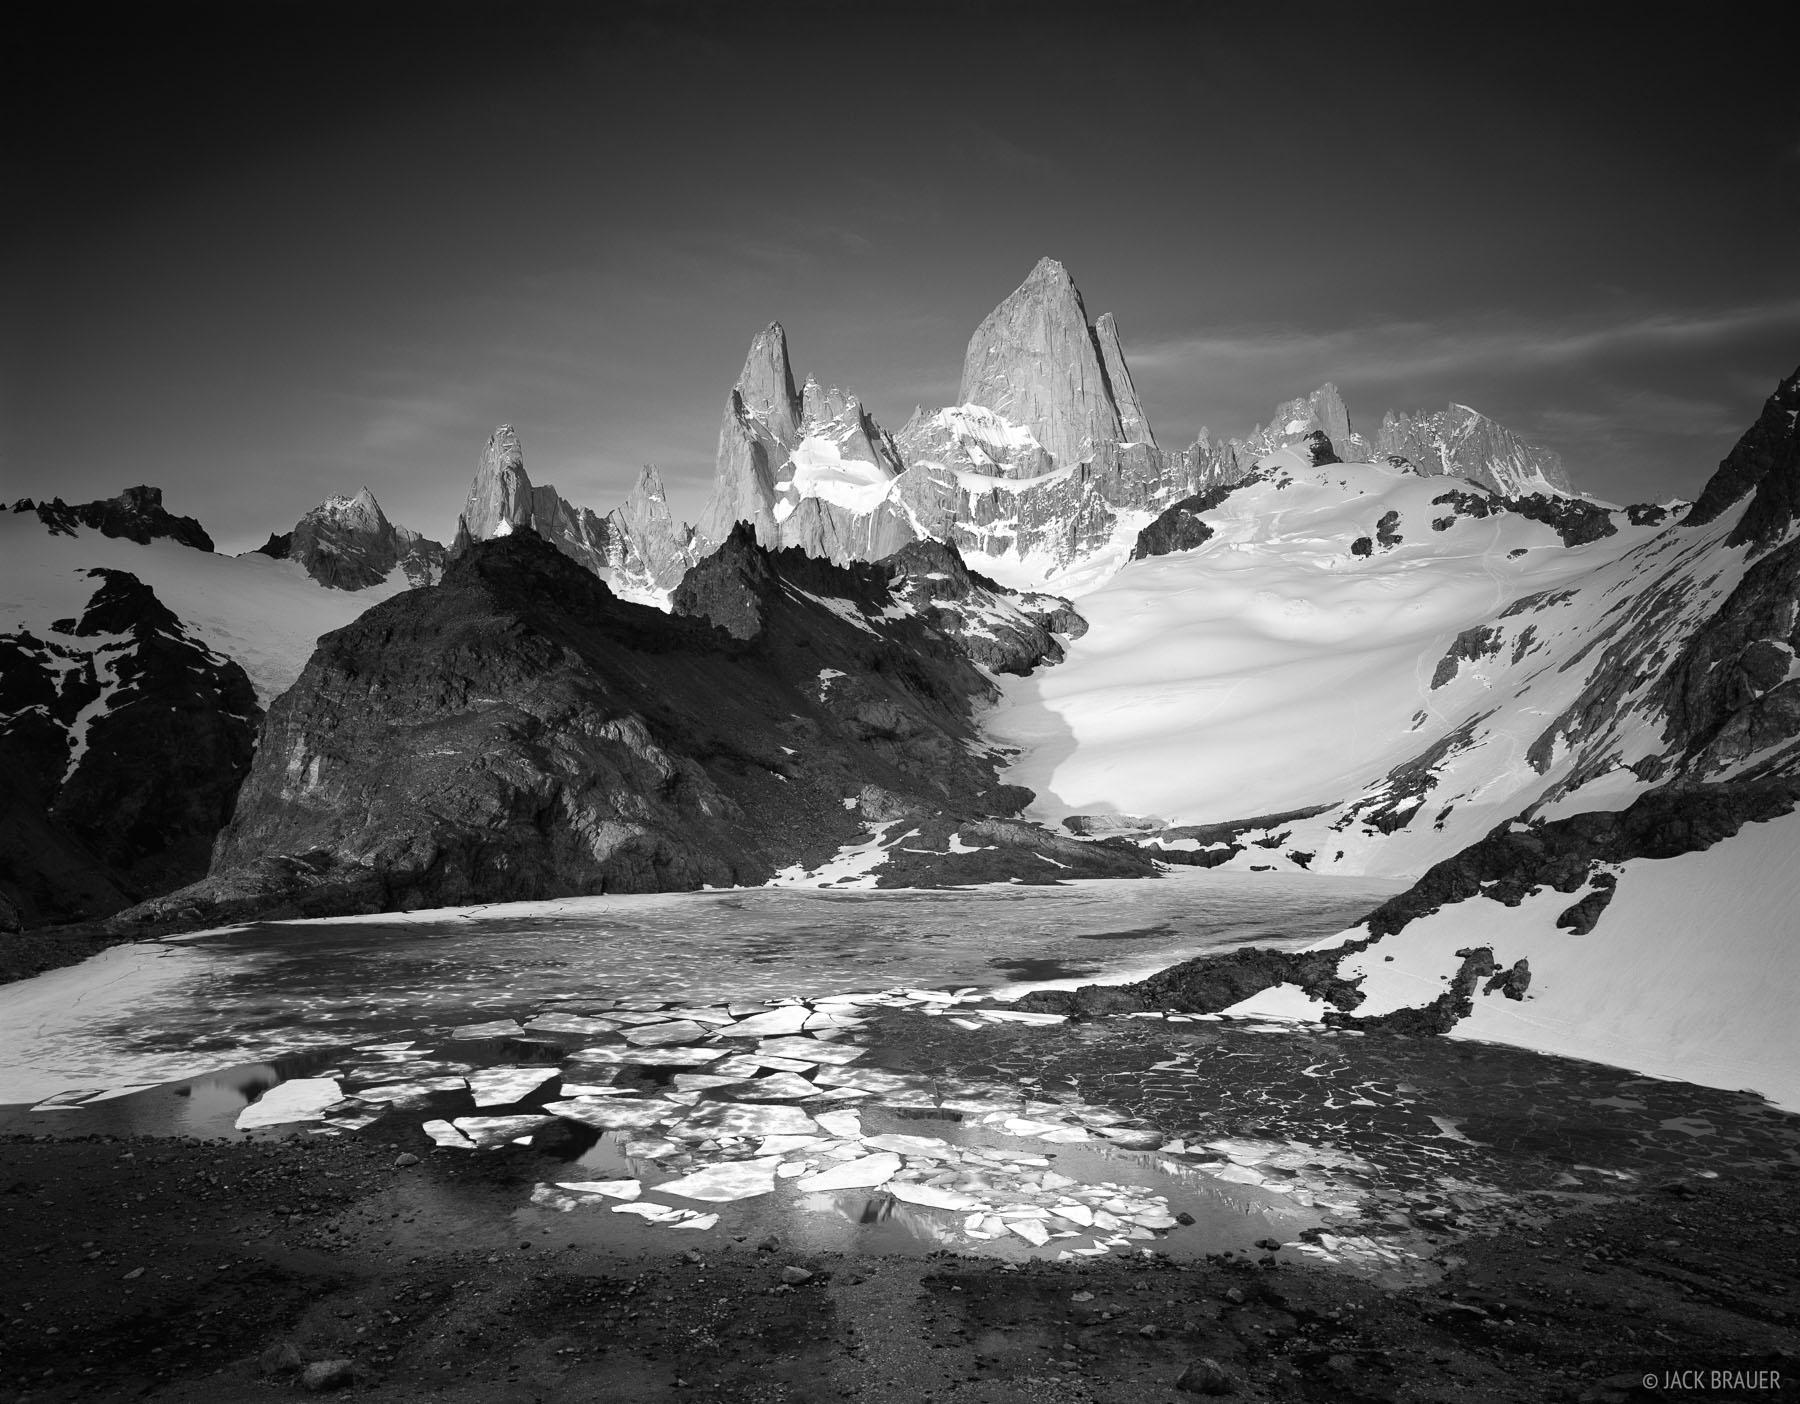 Chalten, Monte Fitz Roy, Laguna de los Tres, Argentina, Patagonia, photo